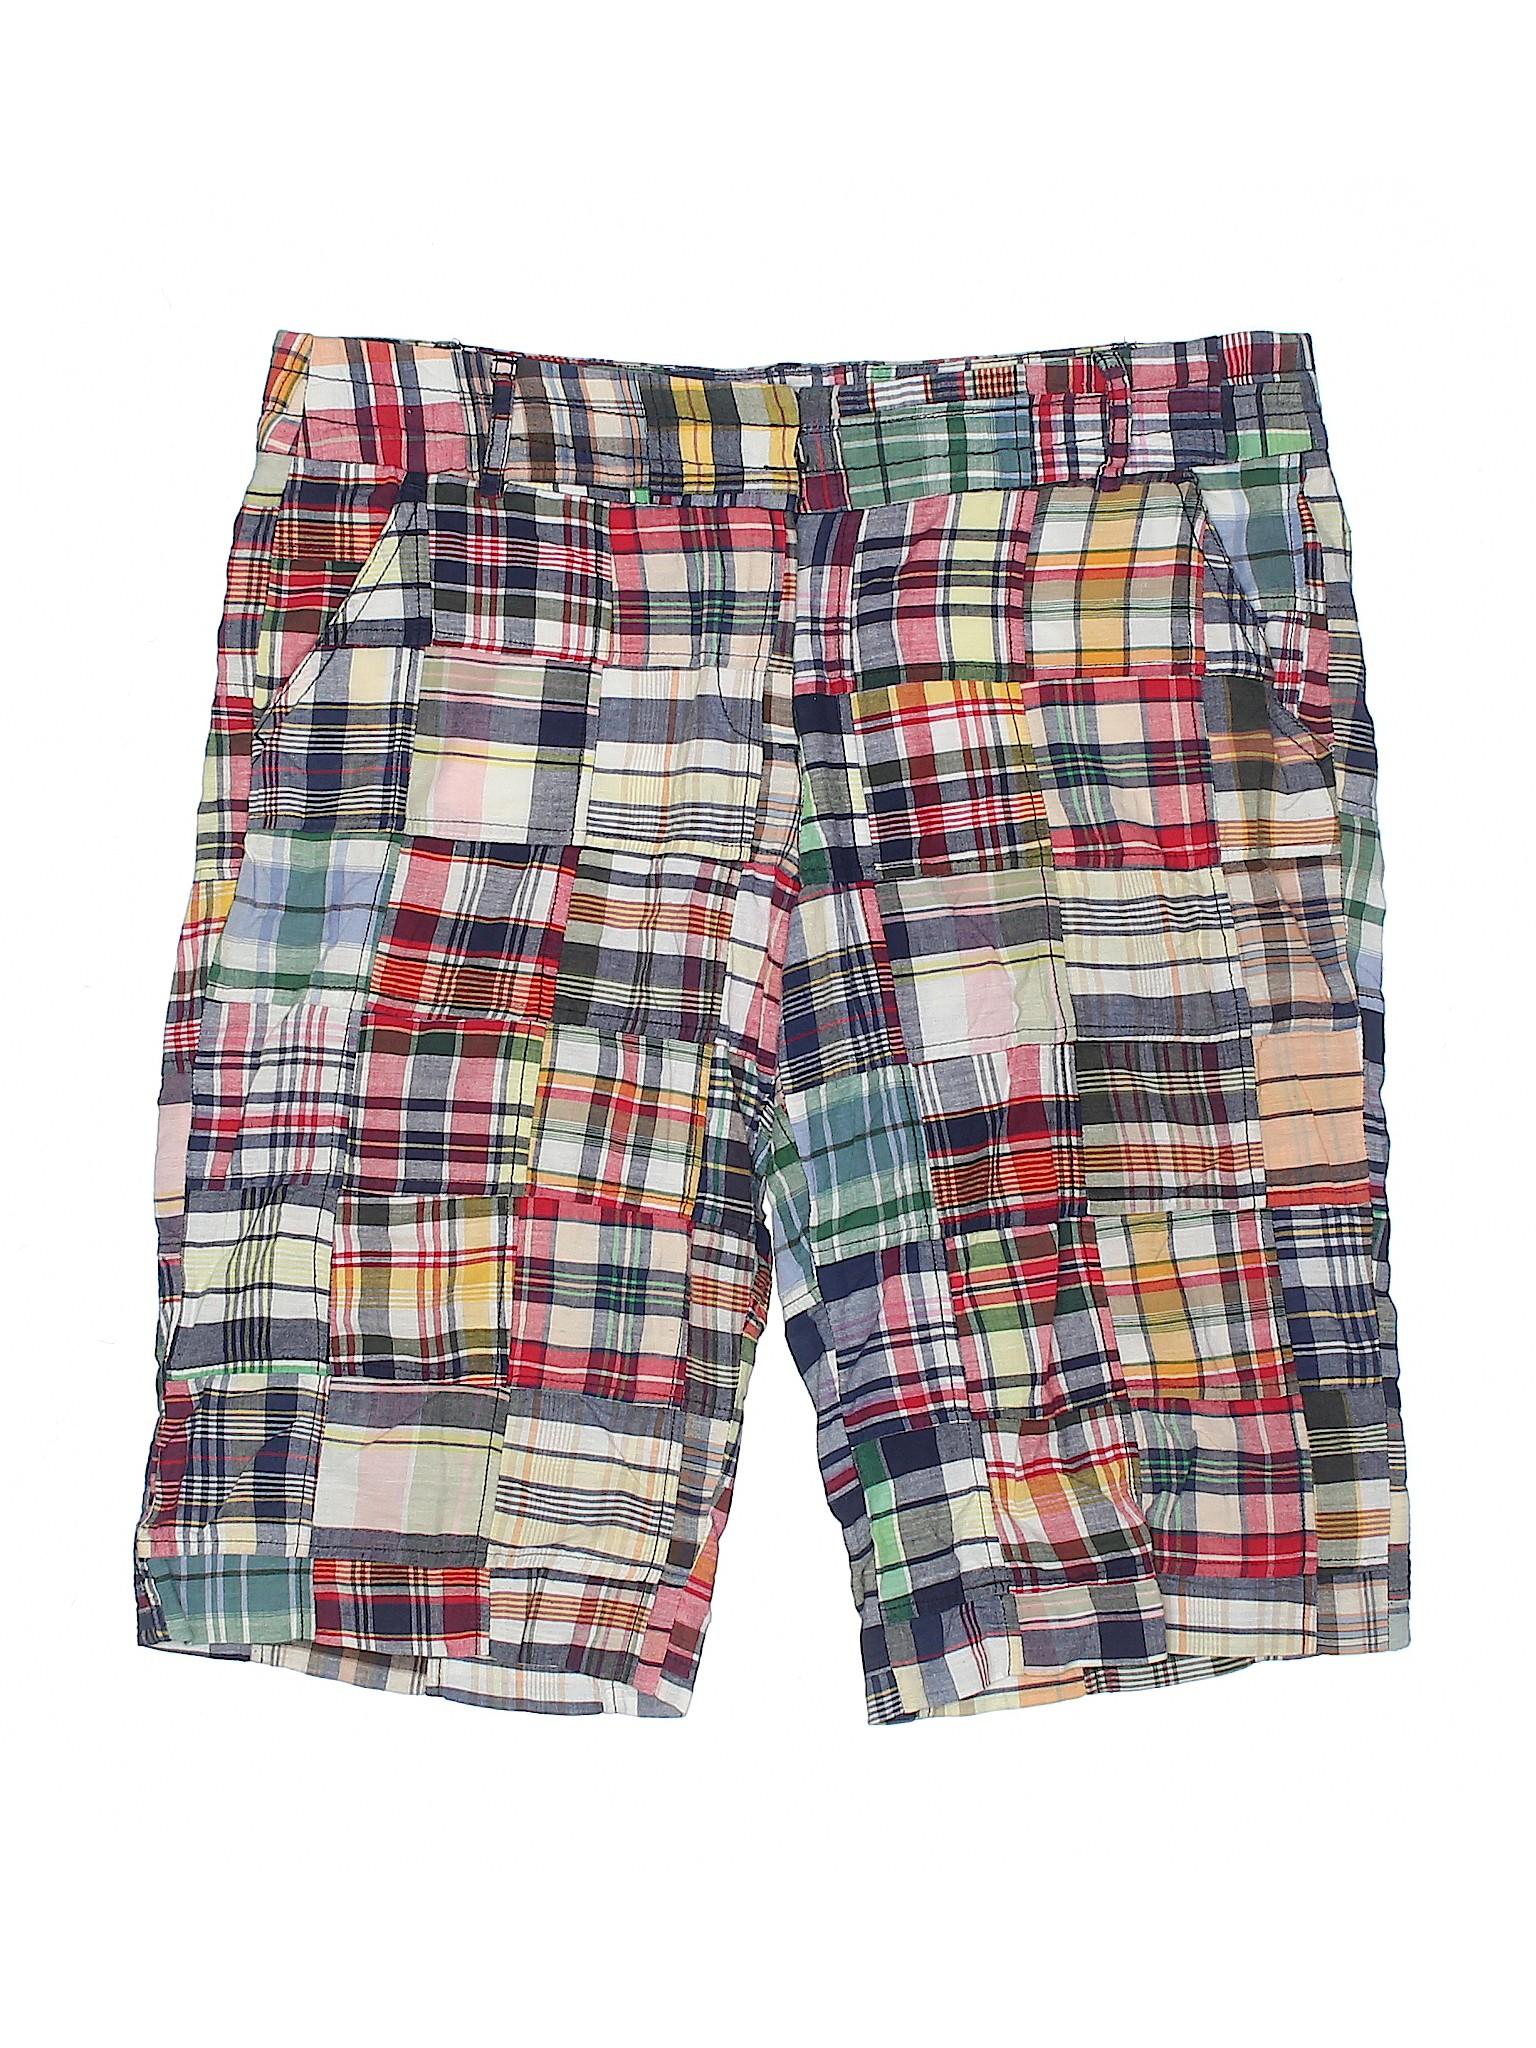 Boutique Khaki leisure Shorts Crew J Ux8Uv